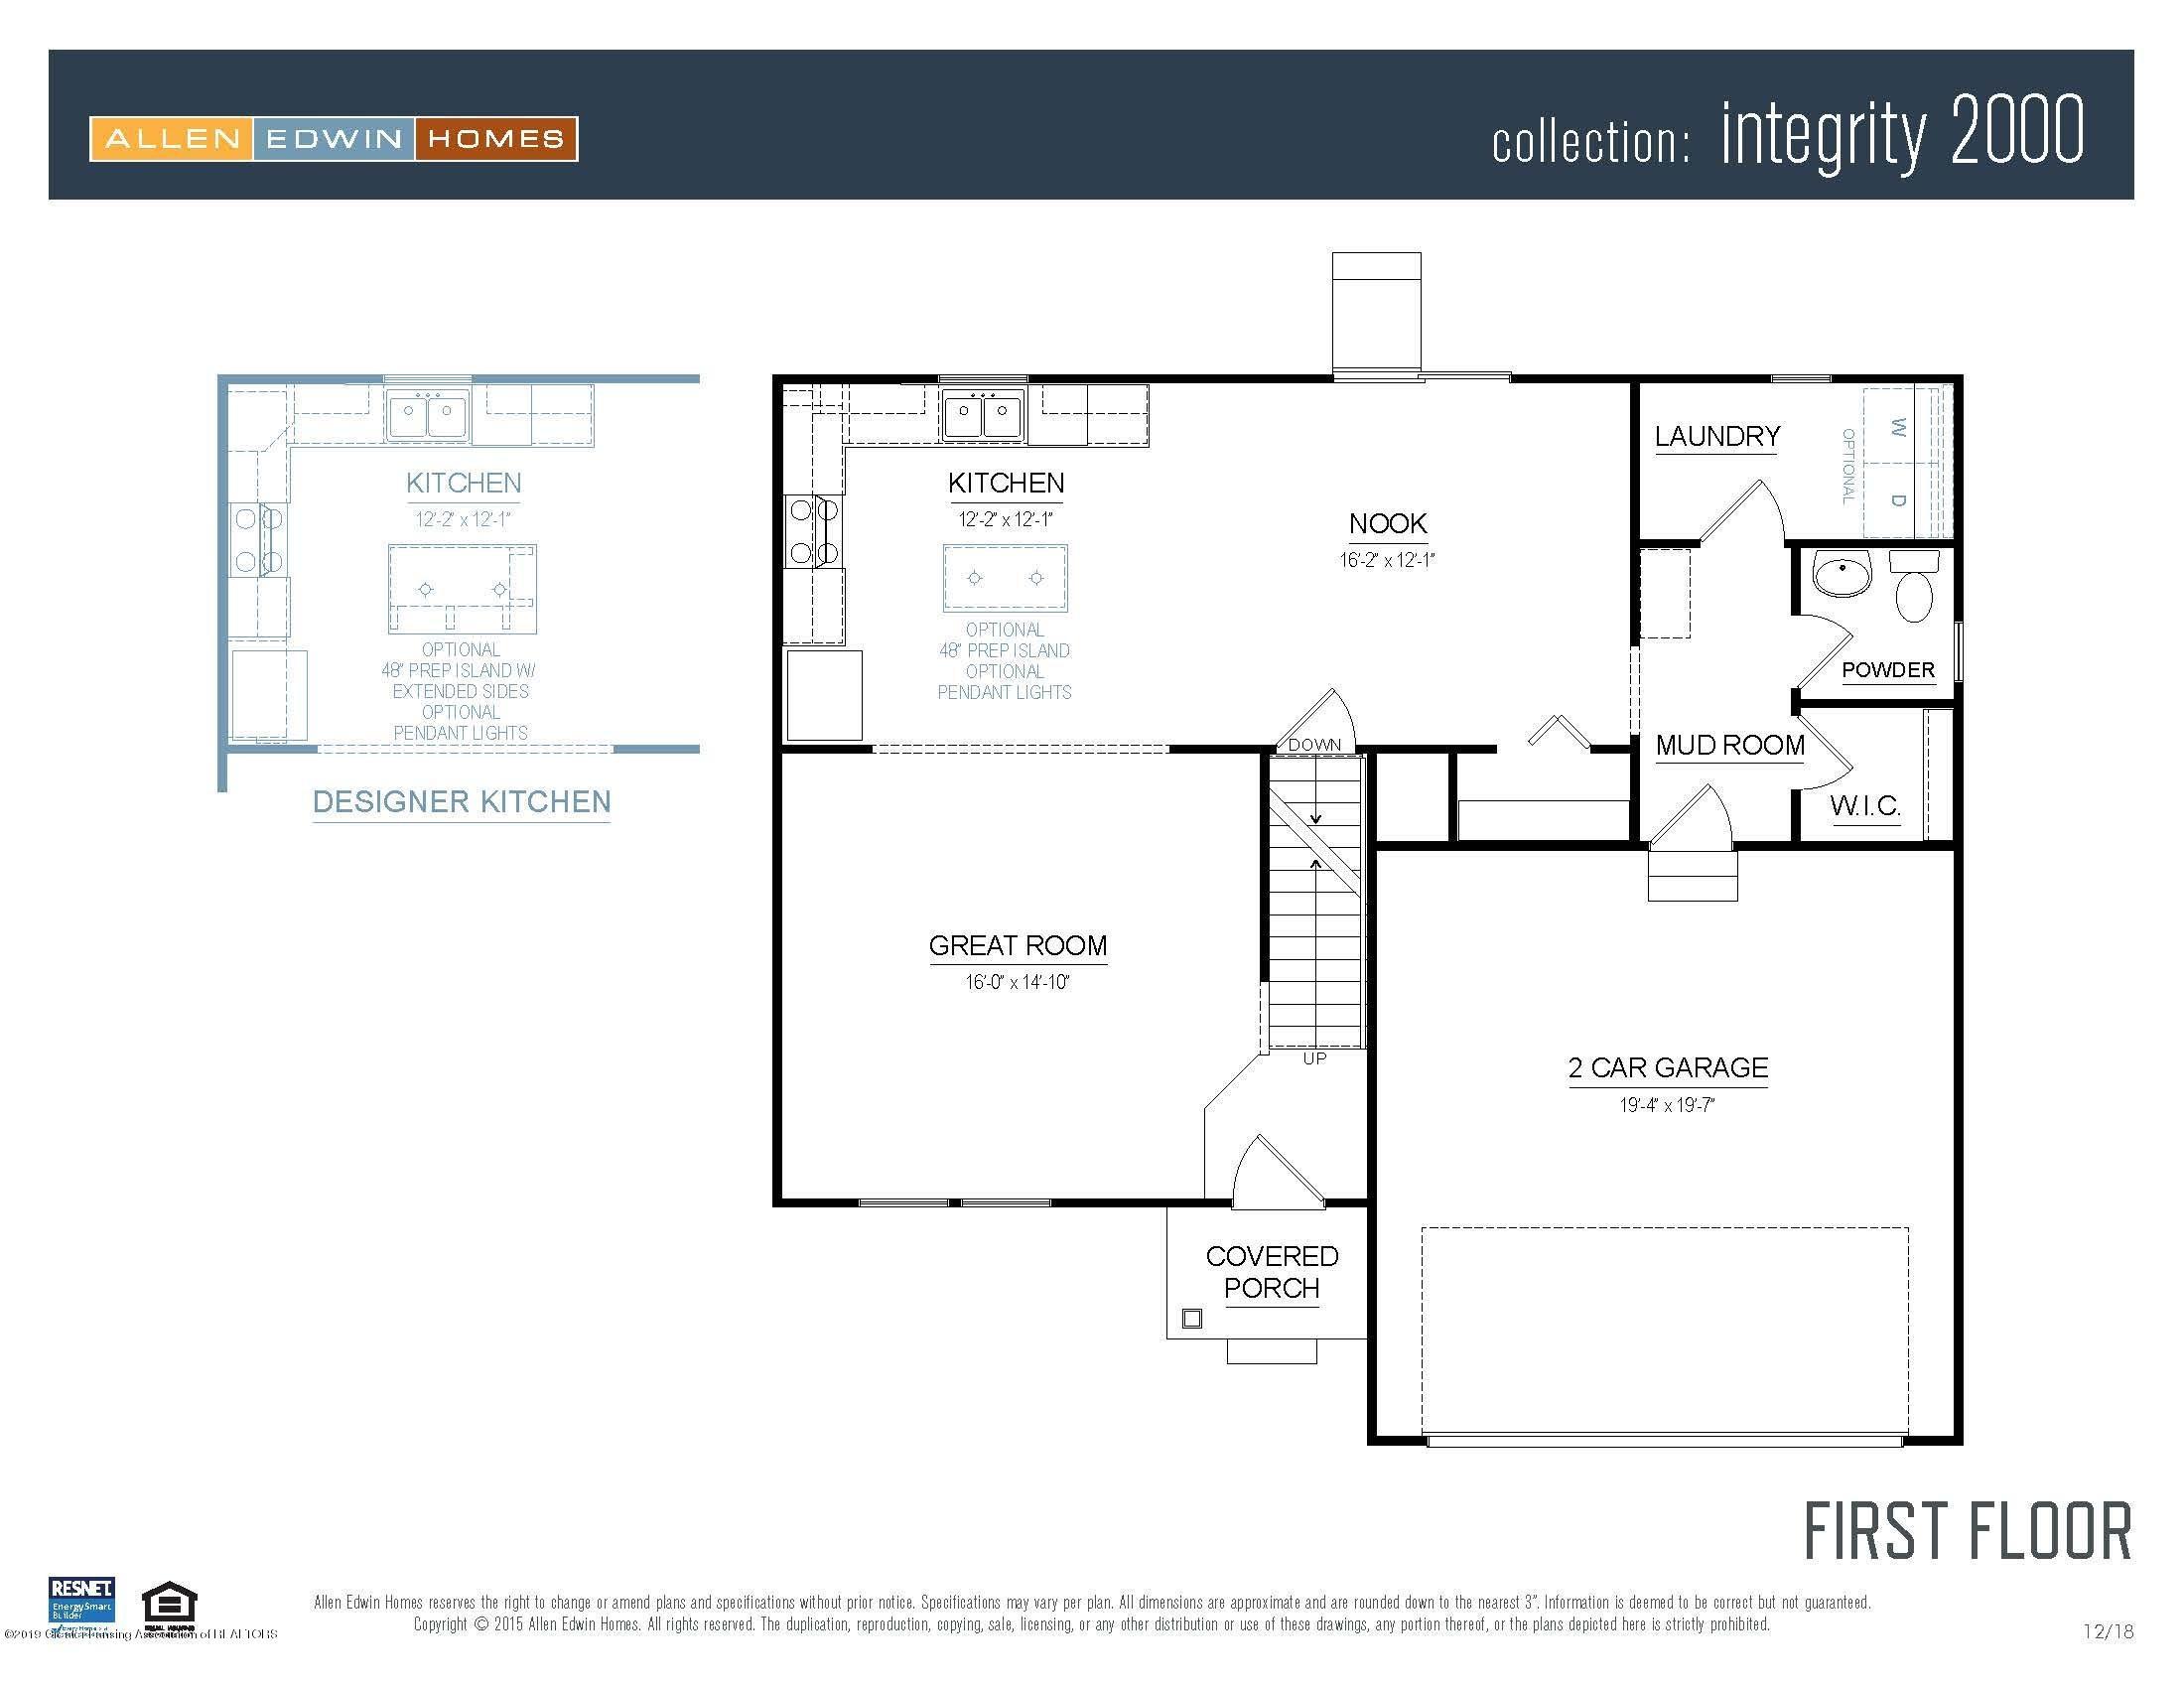 1116 River Oaks Dr - Integrity 2000 V8.0a First Floor - 2